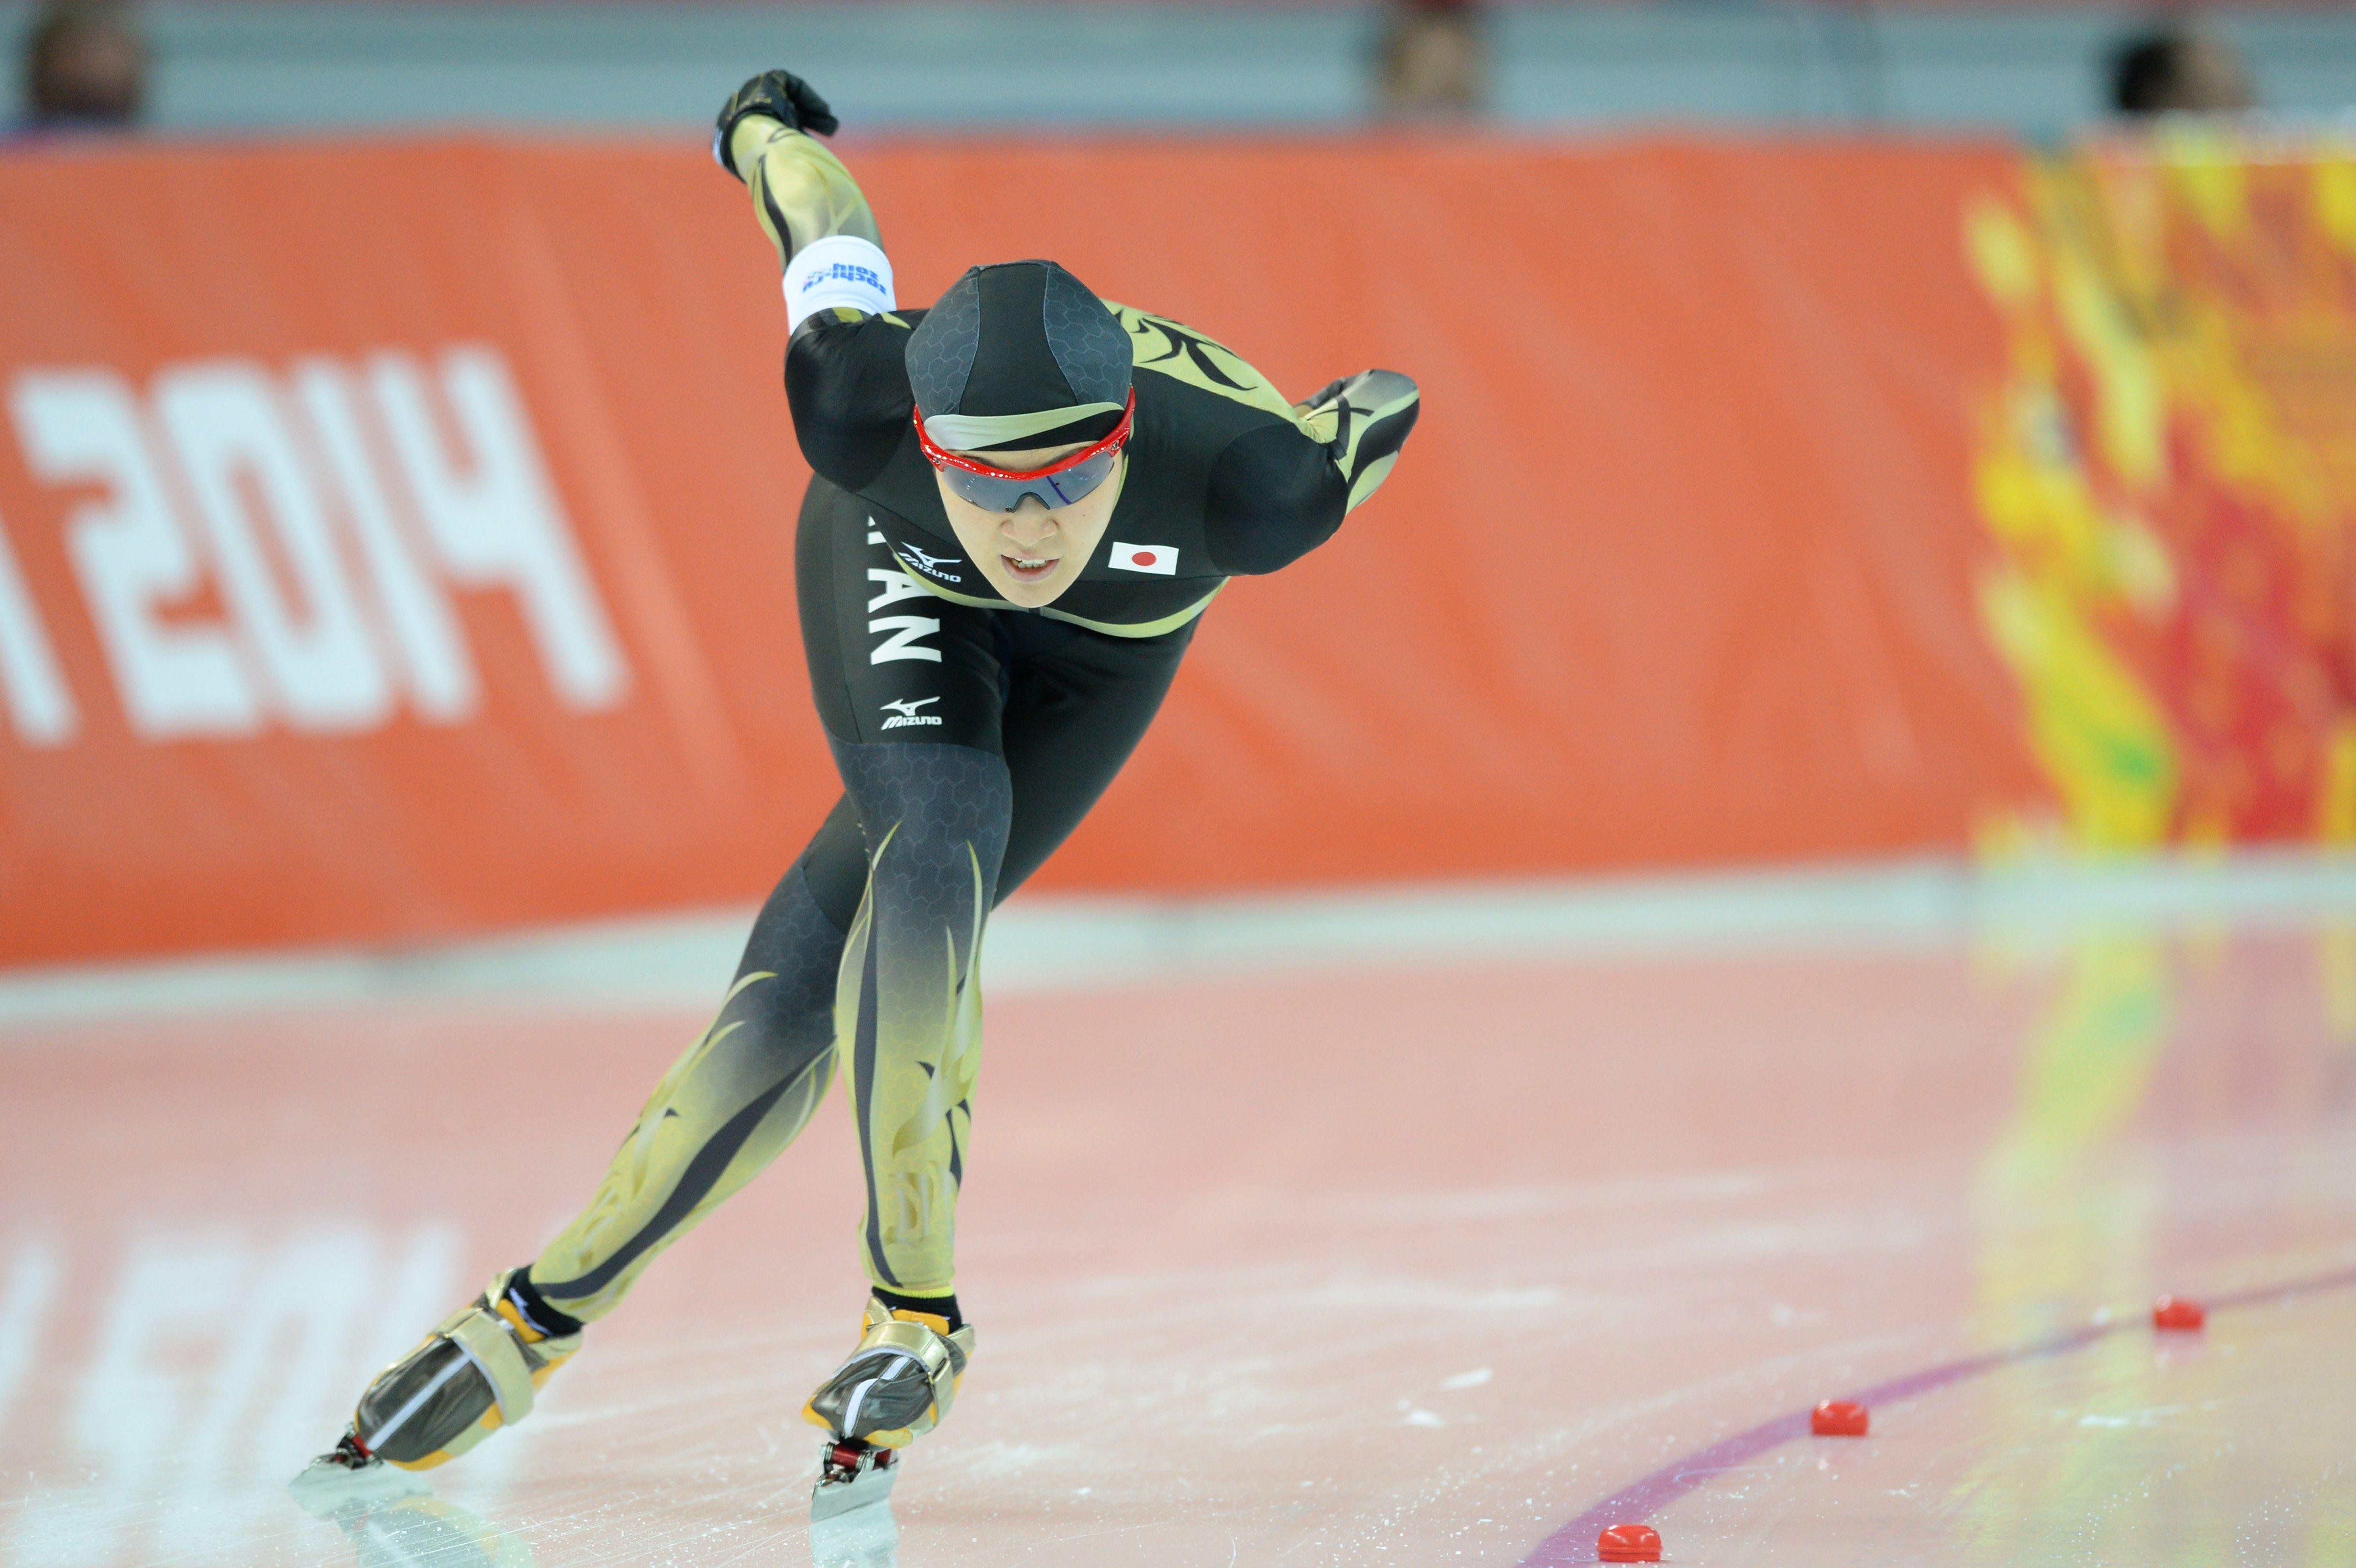 Kjeld Nuis stabilește un nou record la patinaj viteză, 93km/h